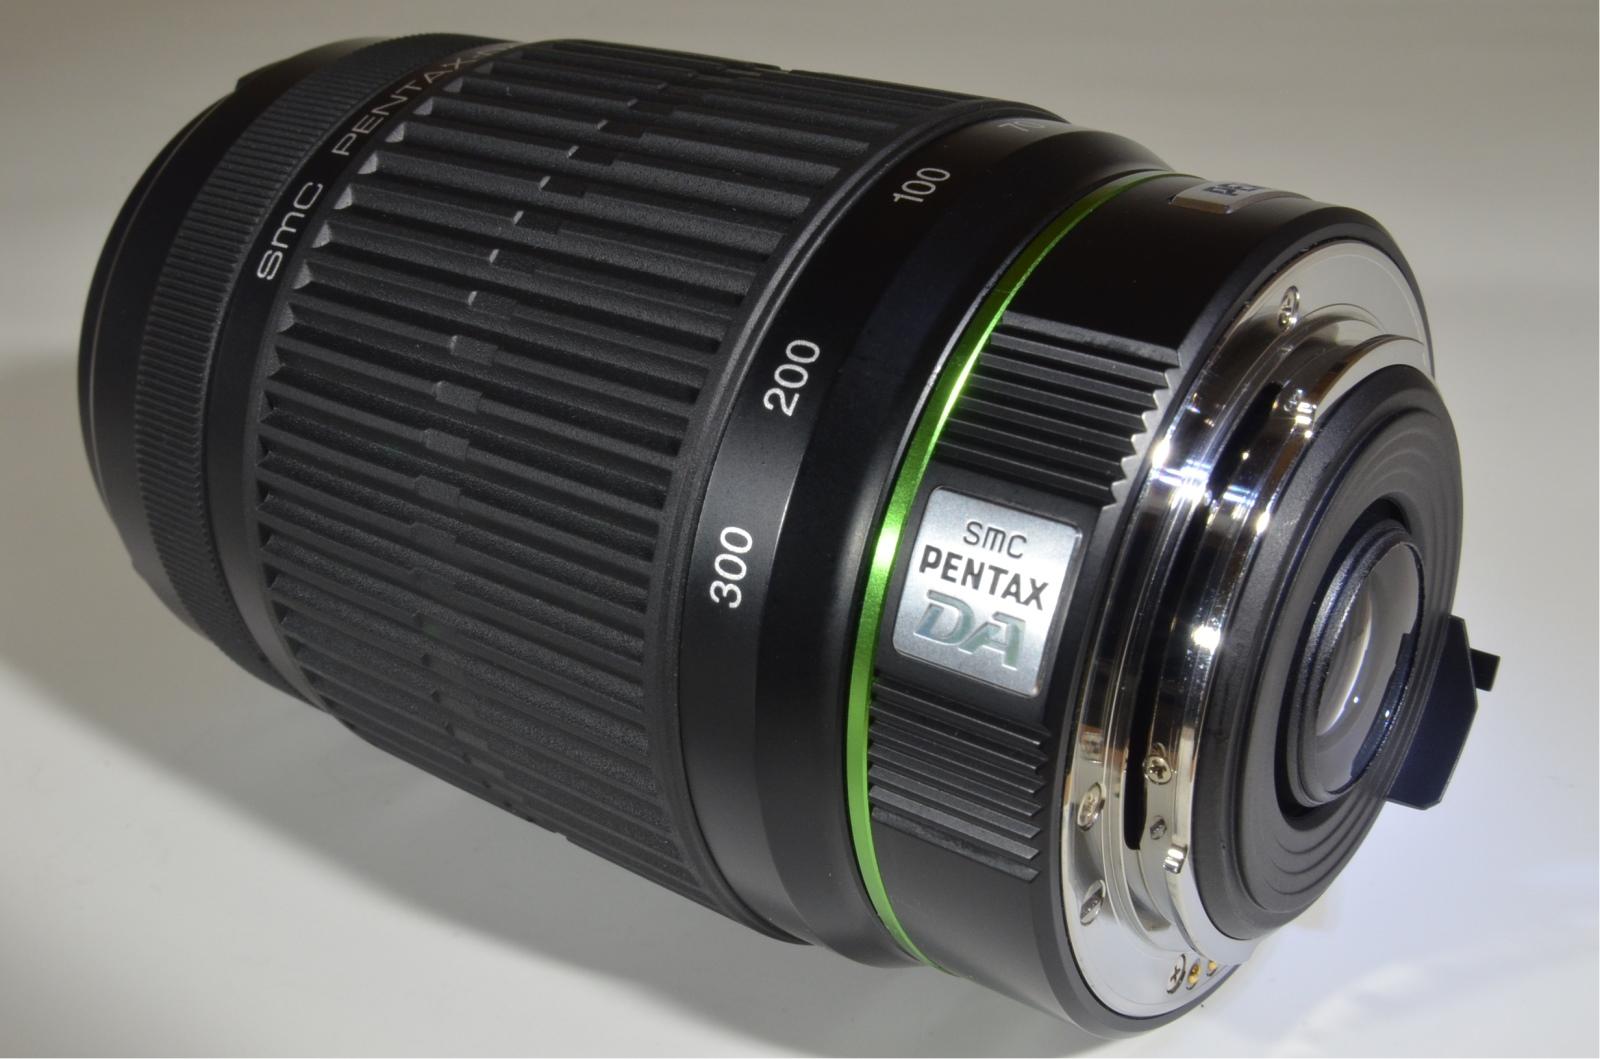 pentax k-5 1181 shot w/ d-bg4 / da 18-135mm wr / 55-300mm f4-5.8 ed